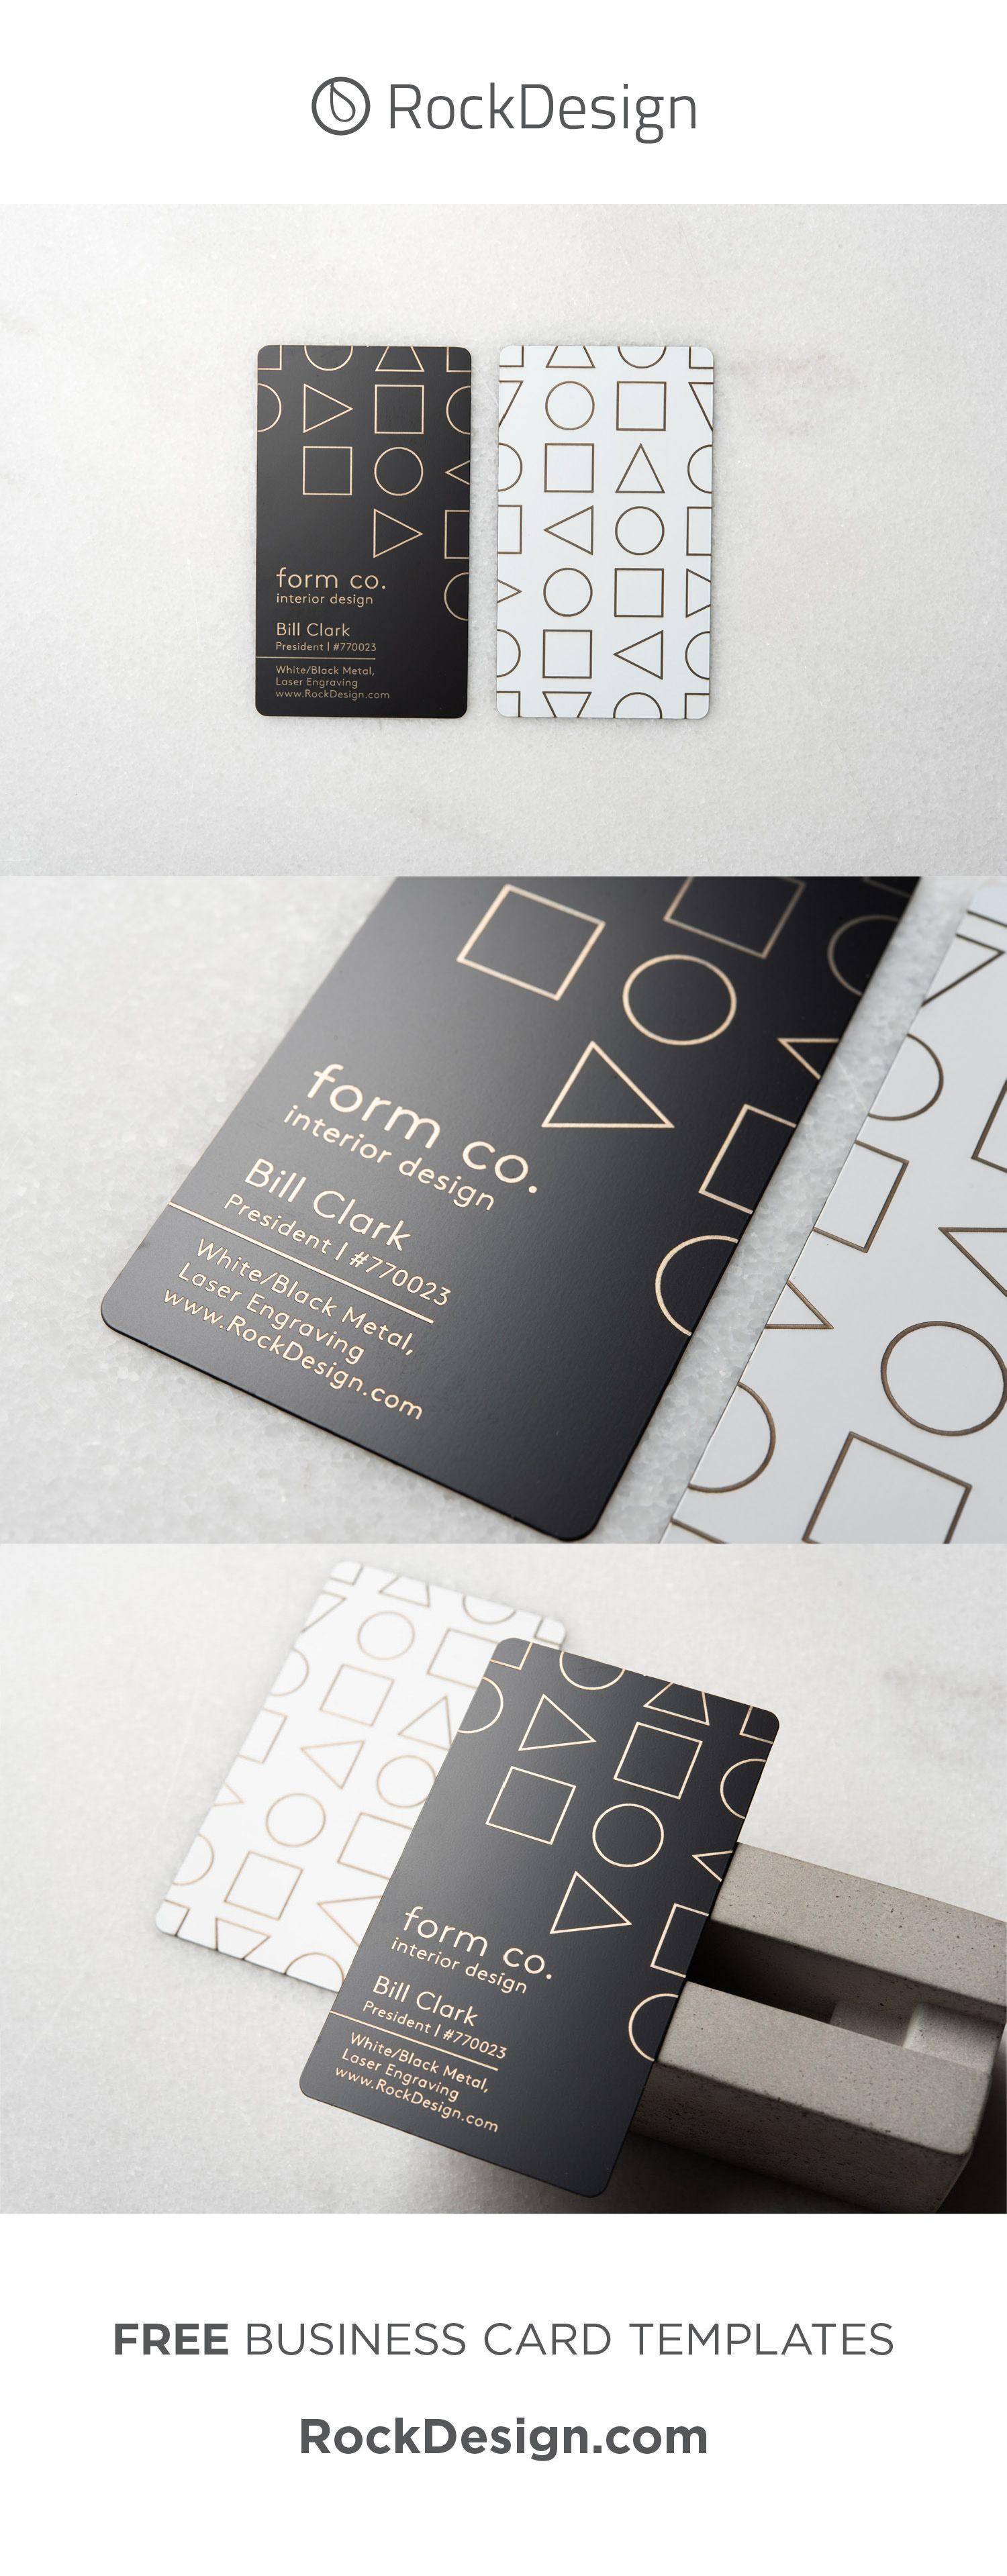 Minimalist Interior Design Business Card Template Design Form Co Metal Business Cards Interior Designer Business Card Visiting Card Design